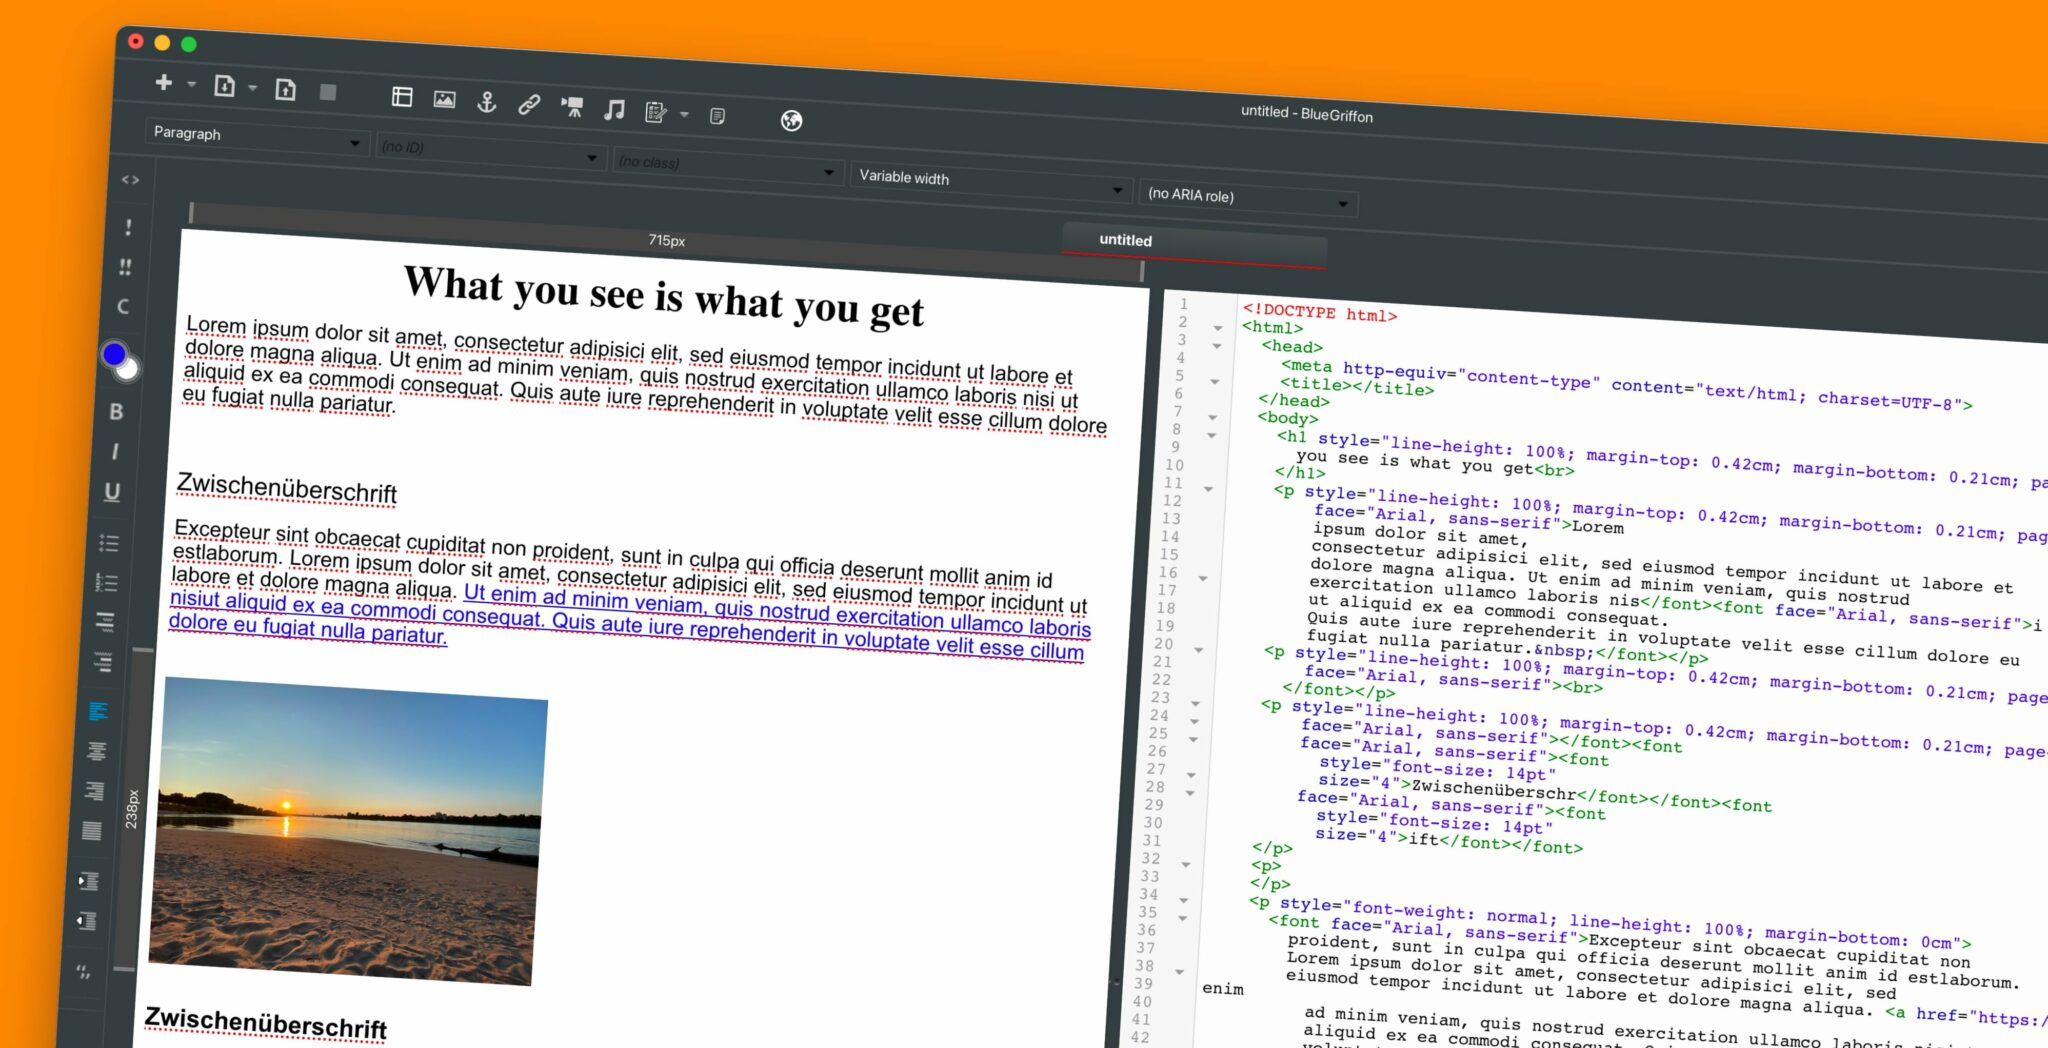 WYSIWYG-Editoren: Webdesign ganz einfach